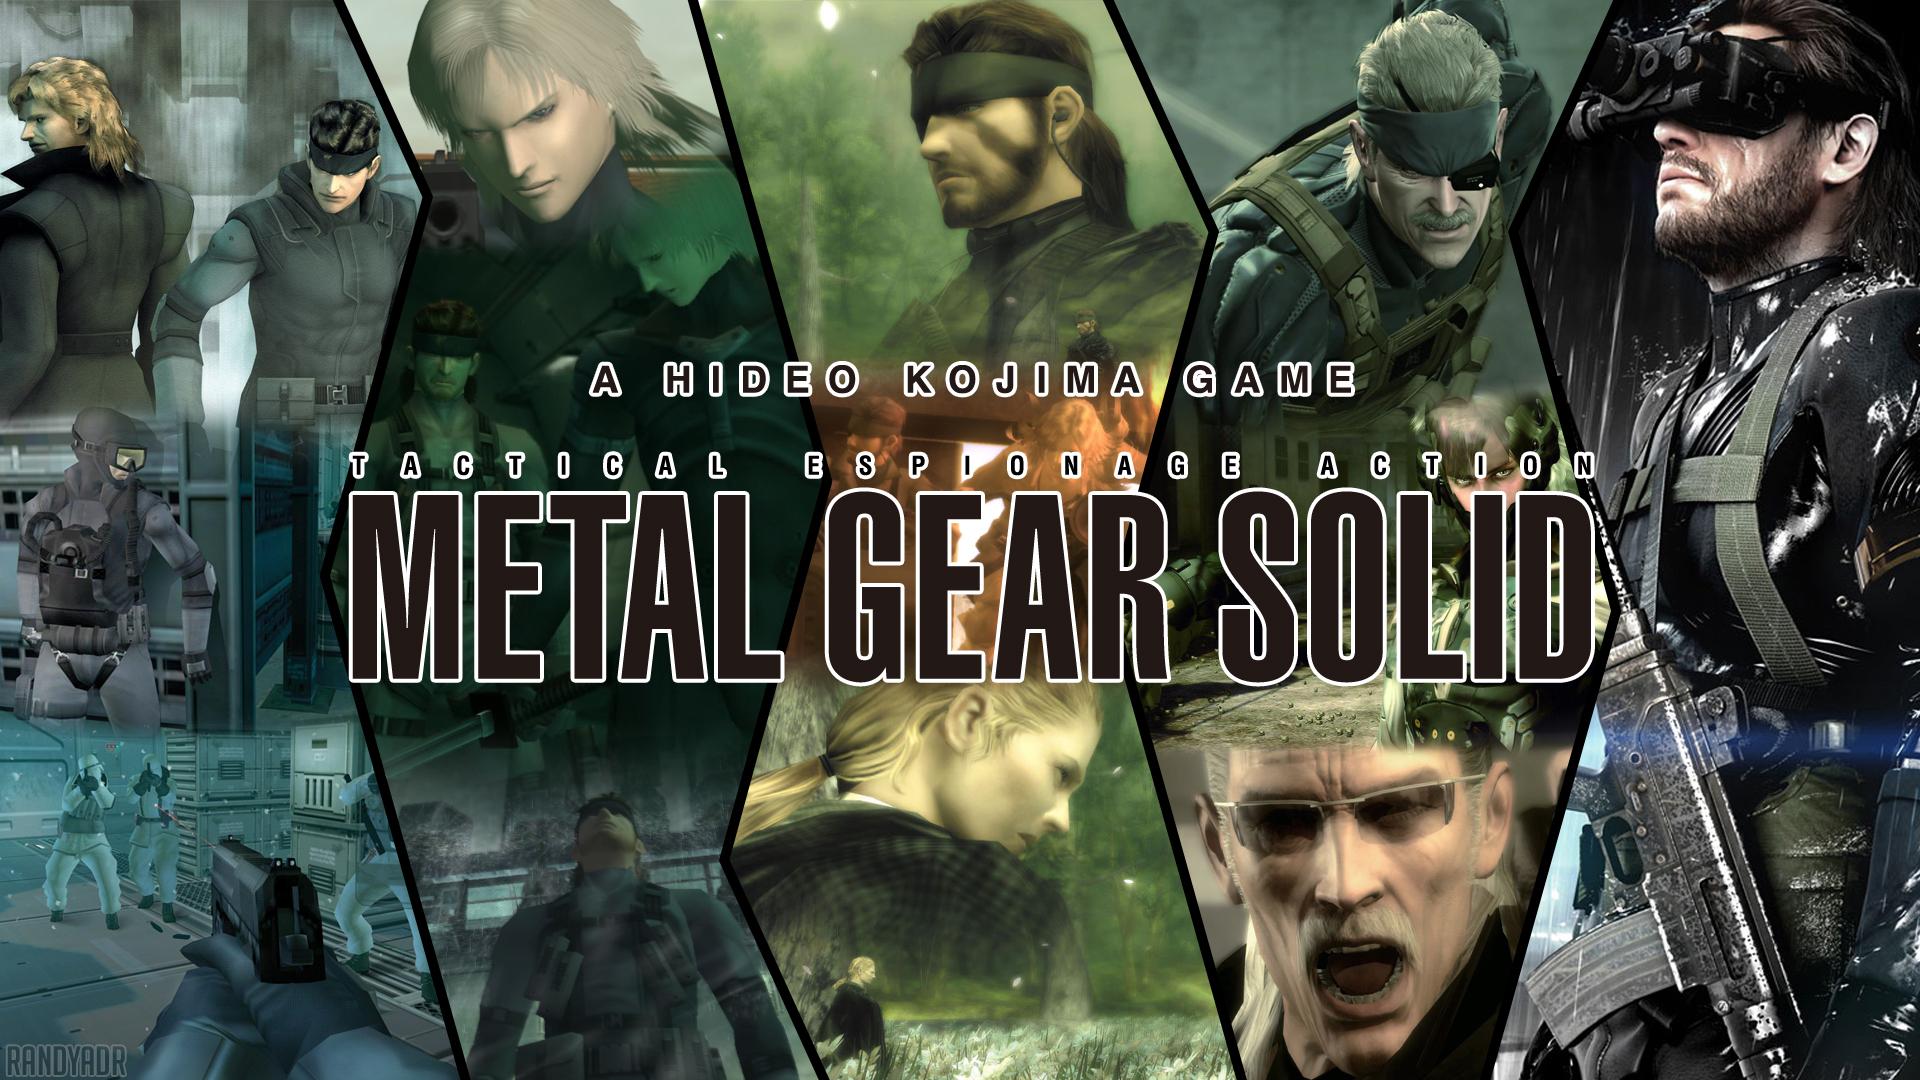 Metal Gear Solid 1 2 3 4 5 339734 Hd Wallpaper Backgrounds